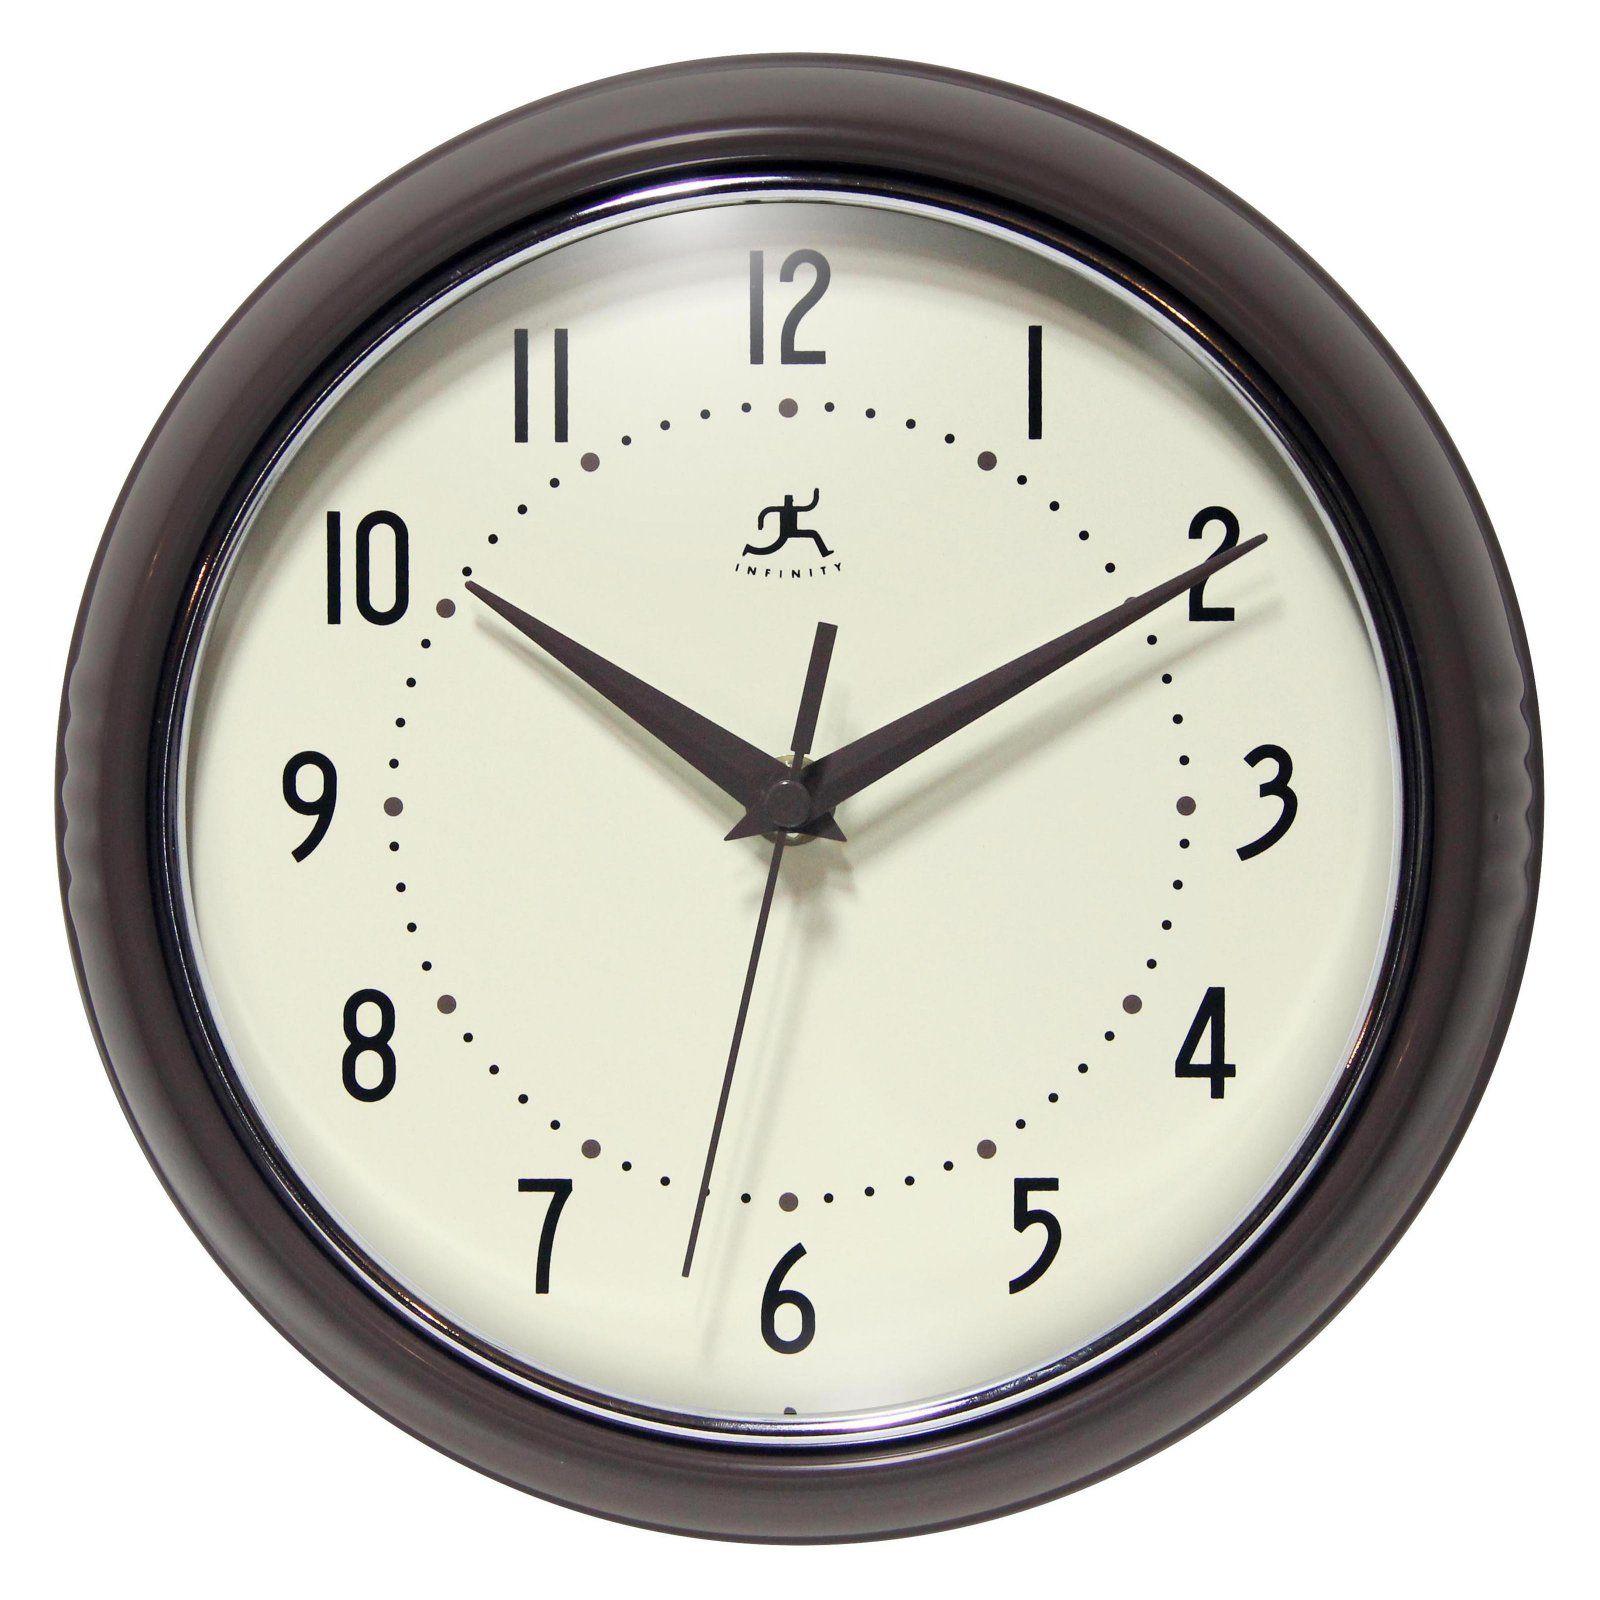 Infinity Instruments Retro Silver 9.5 Inch Wall Clock